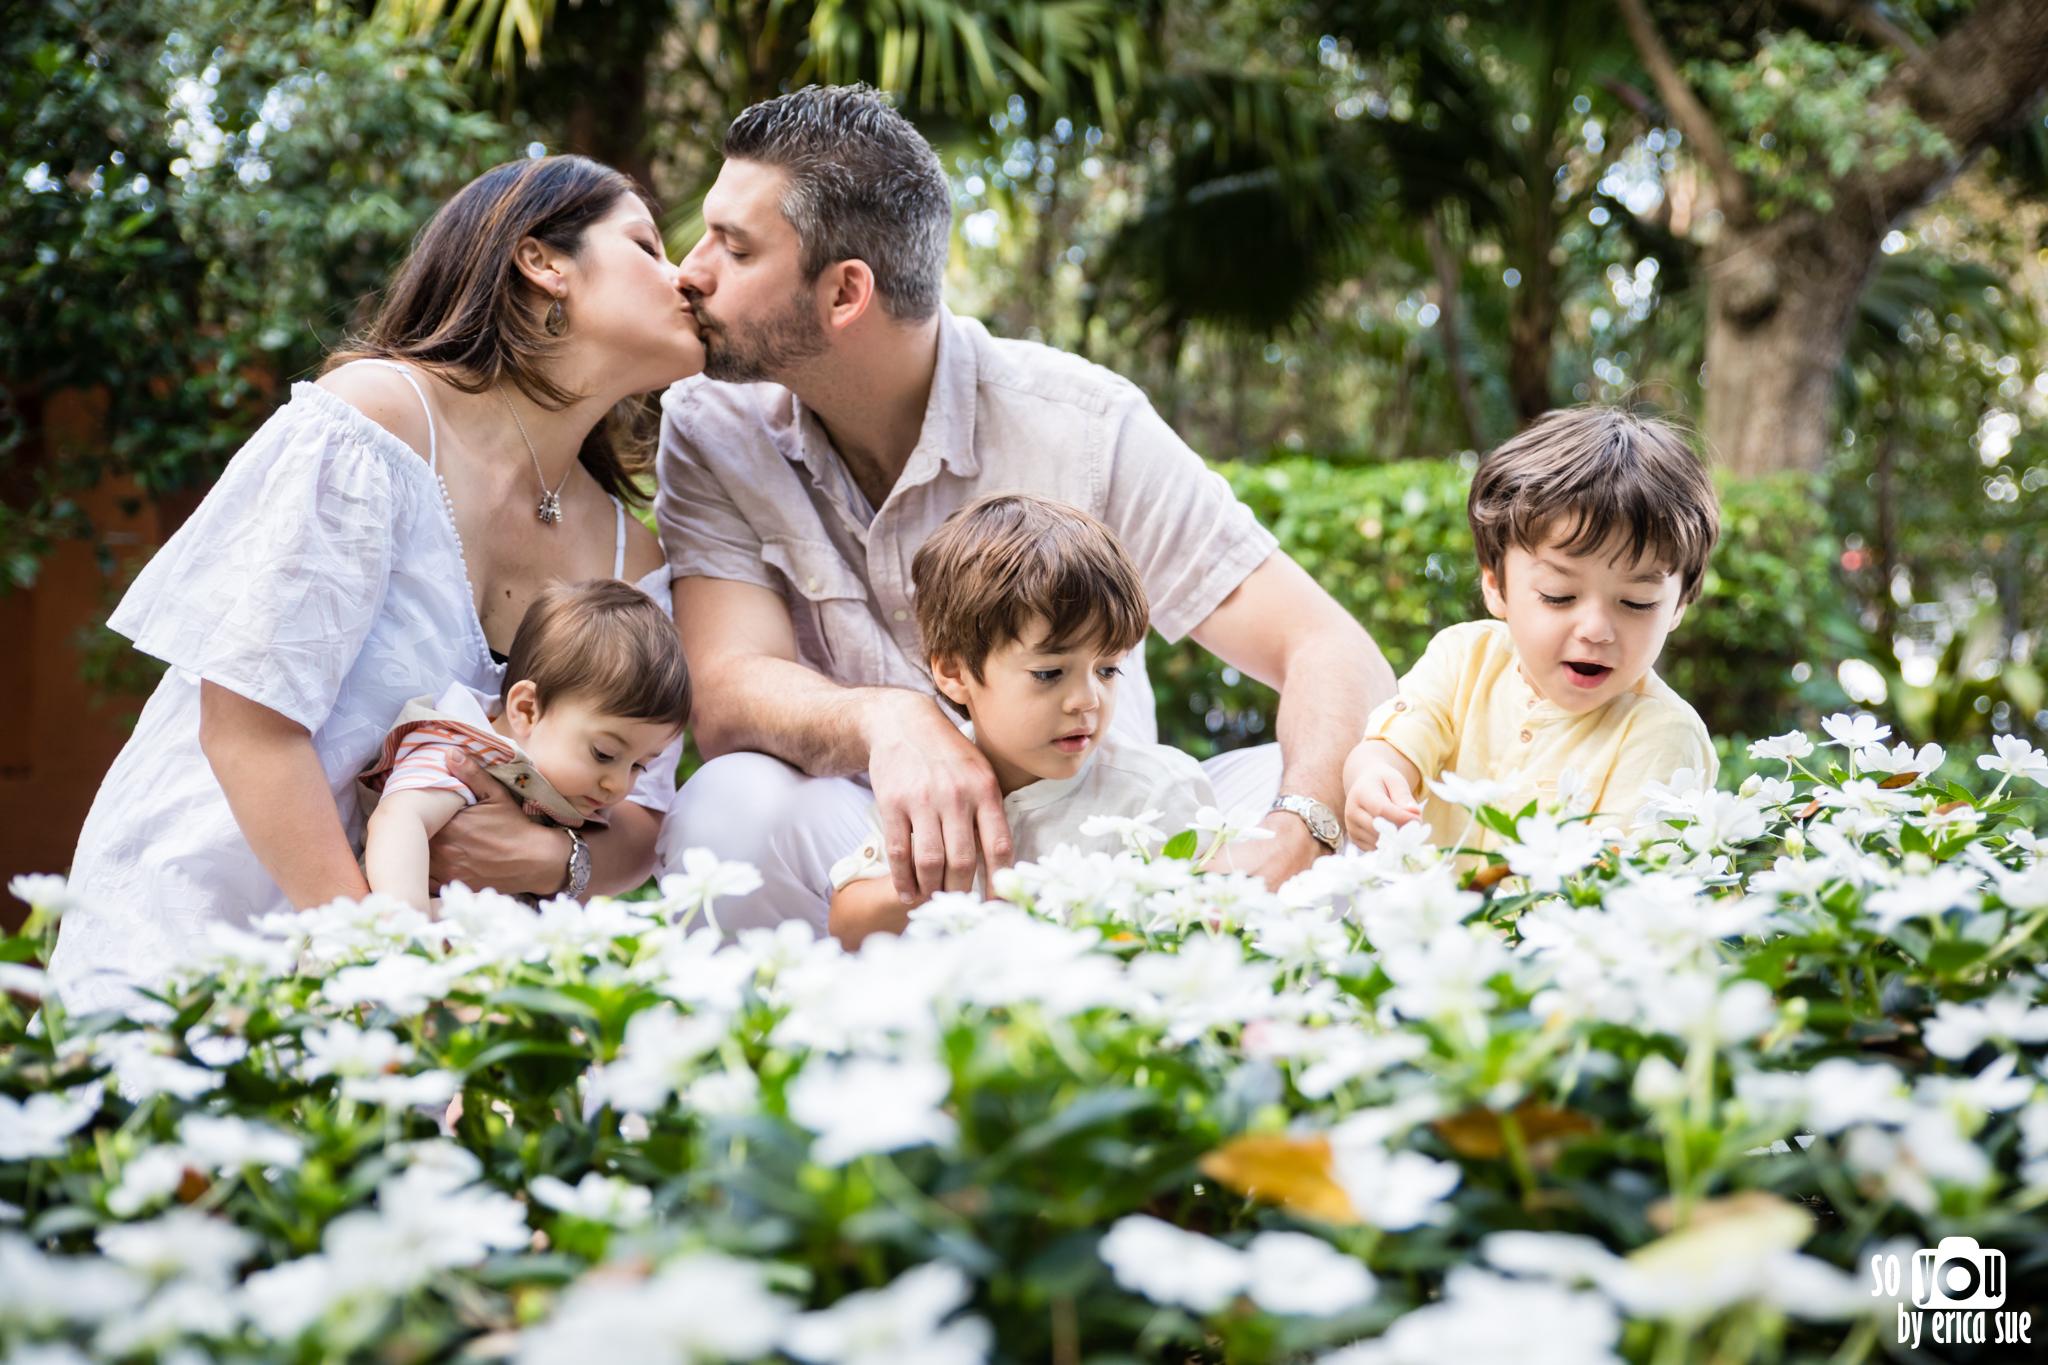 coconut-grove-lifestyle-family-photography-8317.jpg